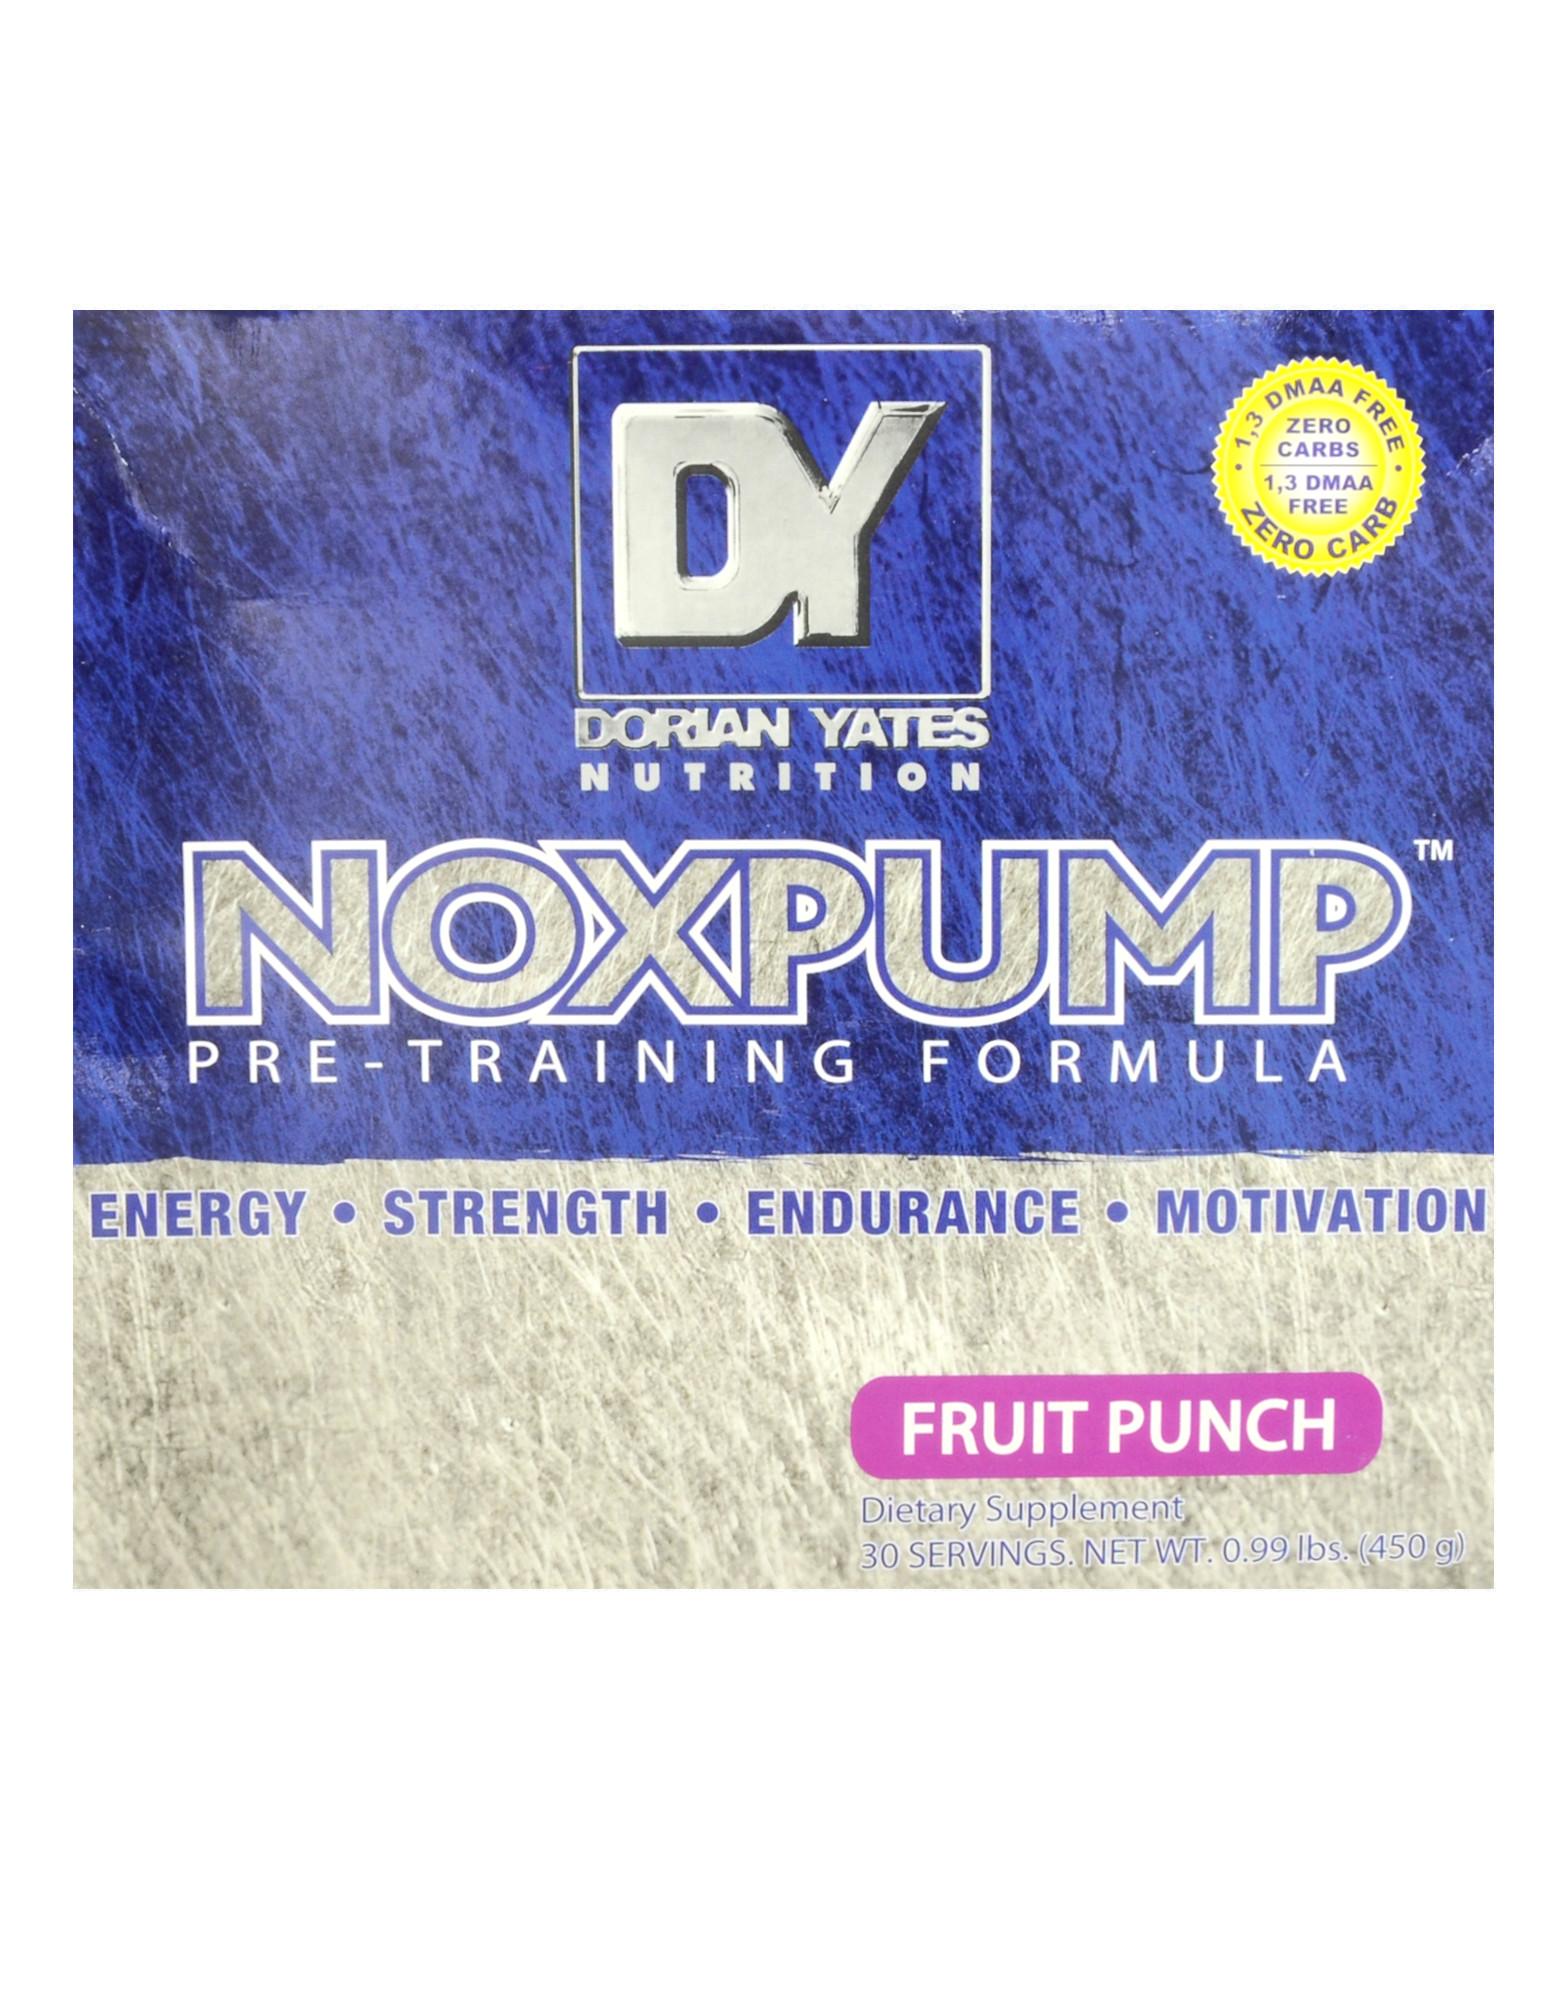 Noxpump By Dorian Yates Nutrition 30 Sachets Of 15 Grams Iafstore Com